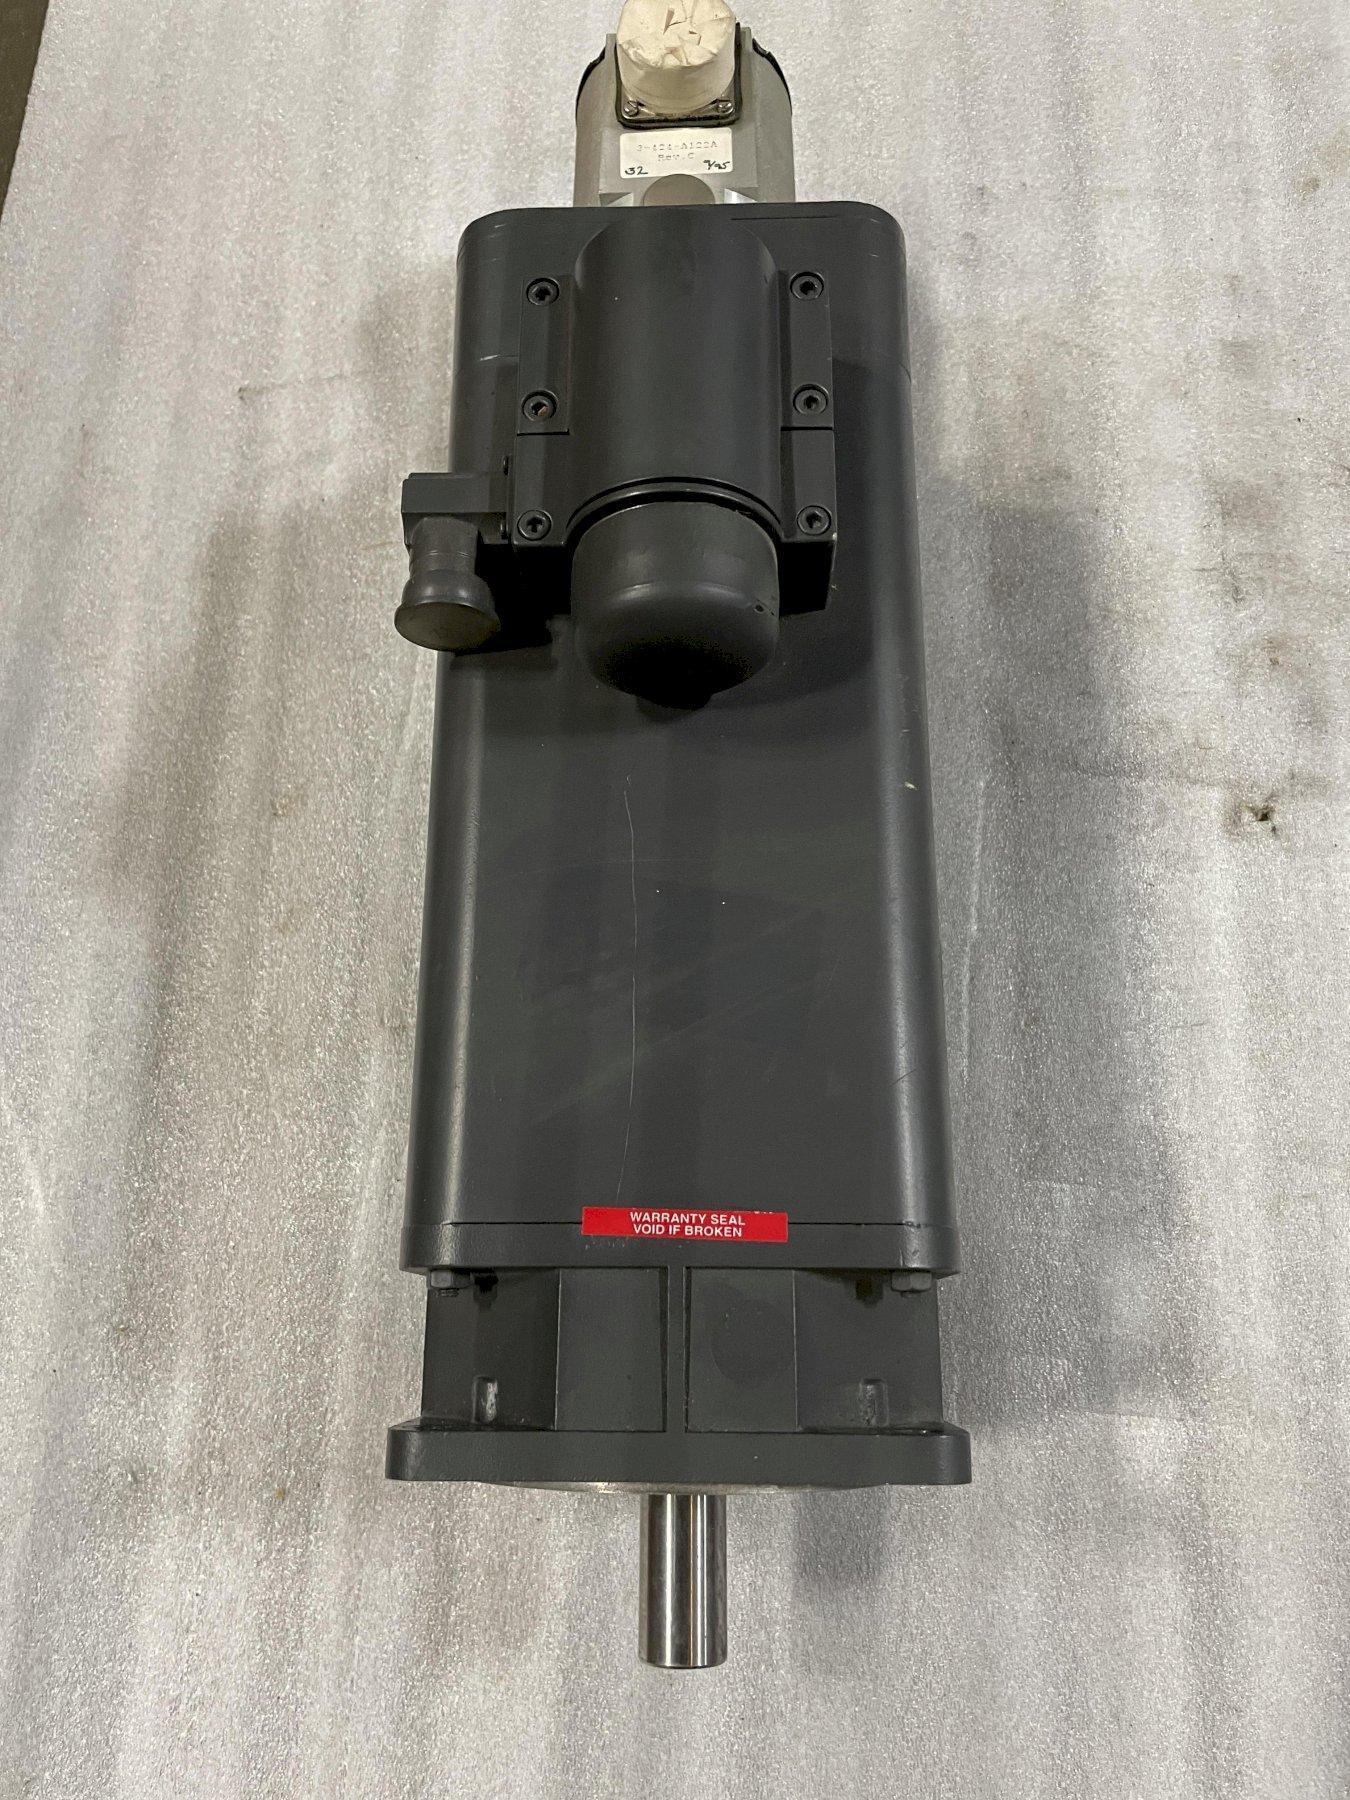 SIEMENS/CINCINNATI MILACRON SERVO MOTOR 1FT5072-0AC01-1-Z Milacron # E F894 2968 01 009. Use only with 6SC610 Drives.